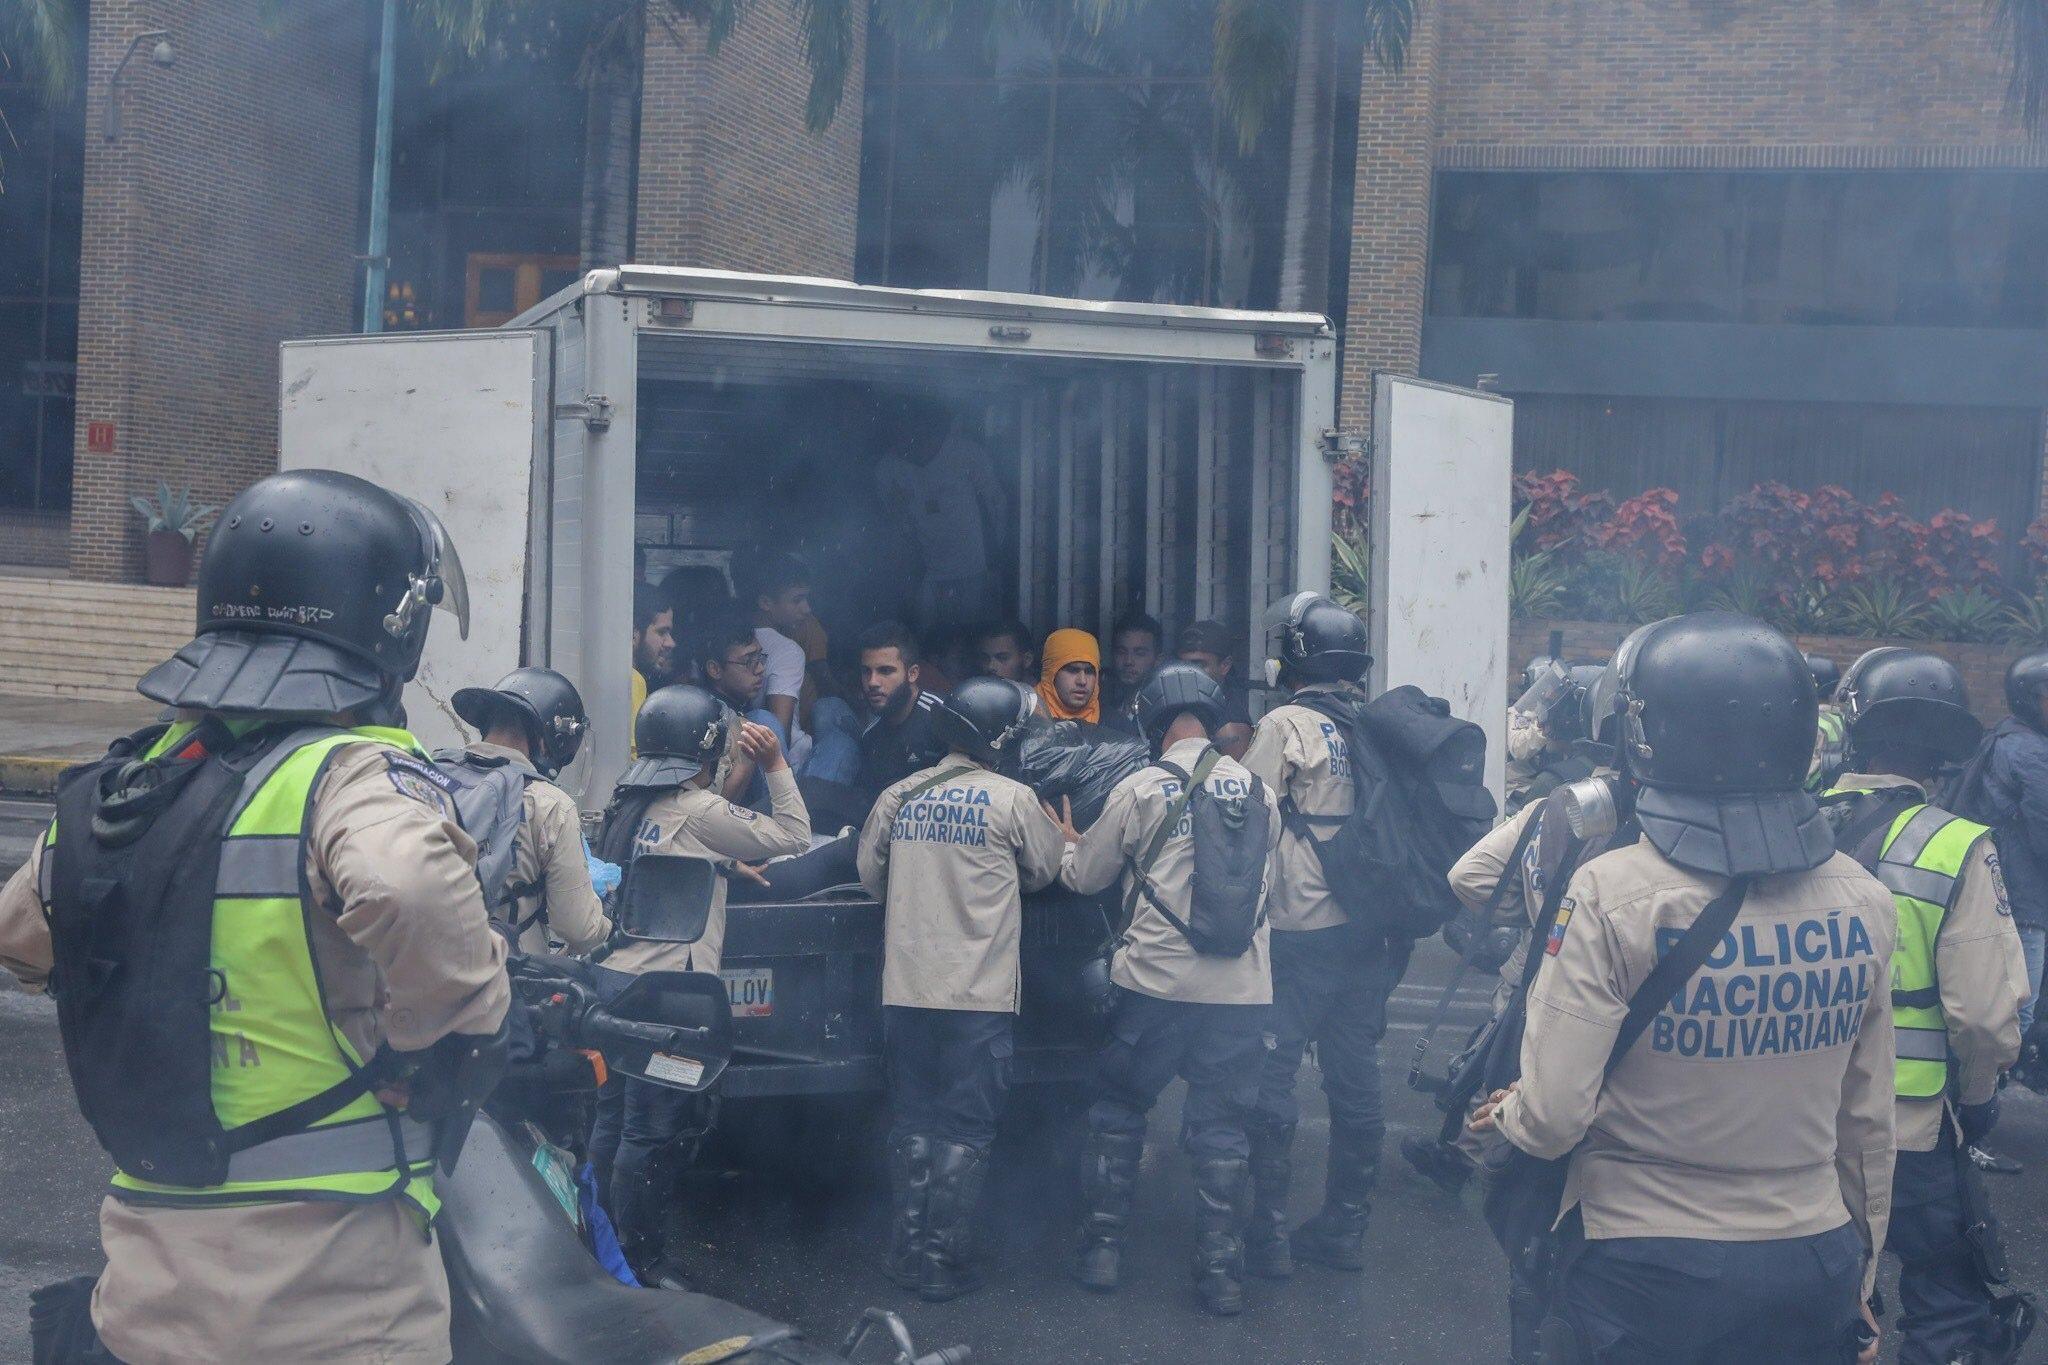 Venezuela: studenti in protesta pacifica a Caracas arrestati brutalmente